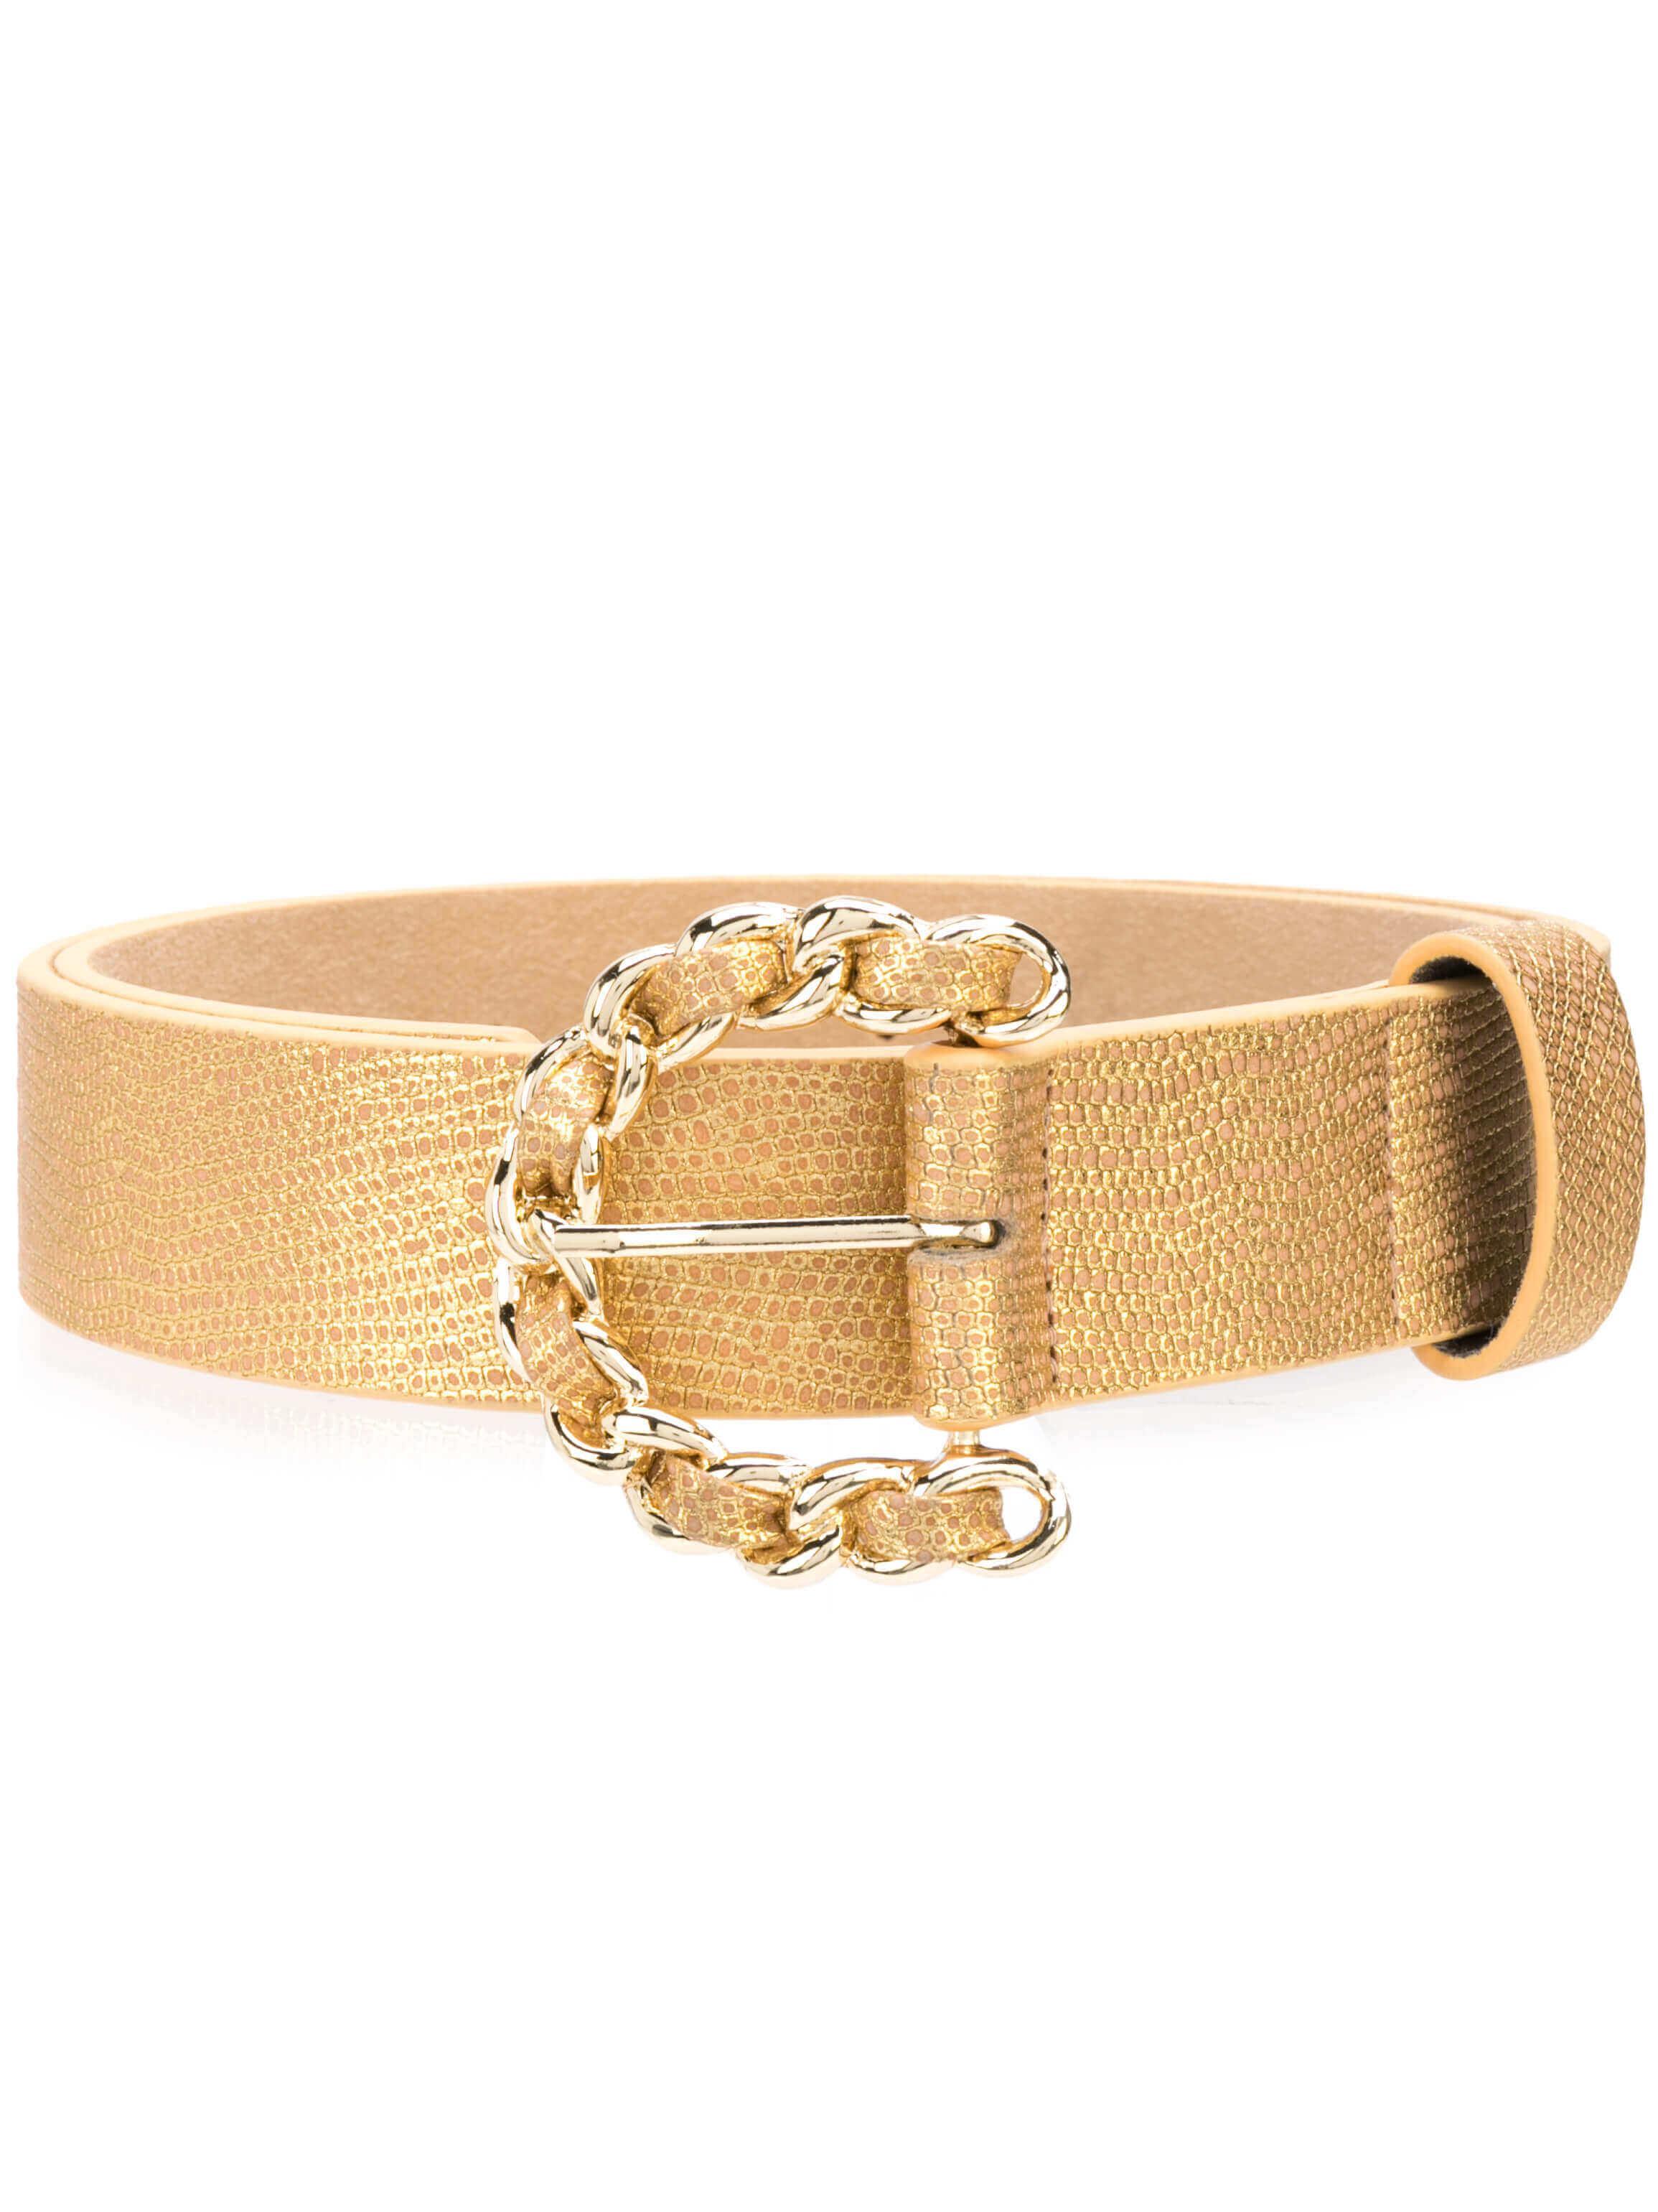 Anabella Chain Buckle